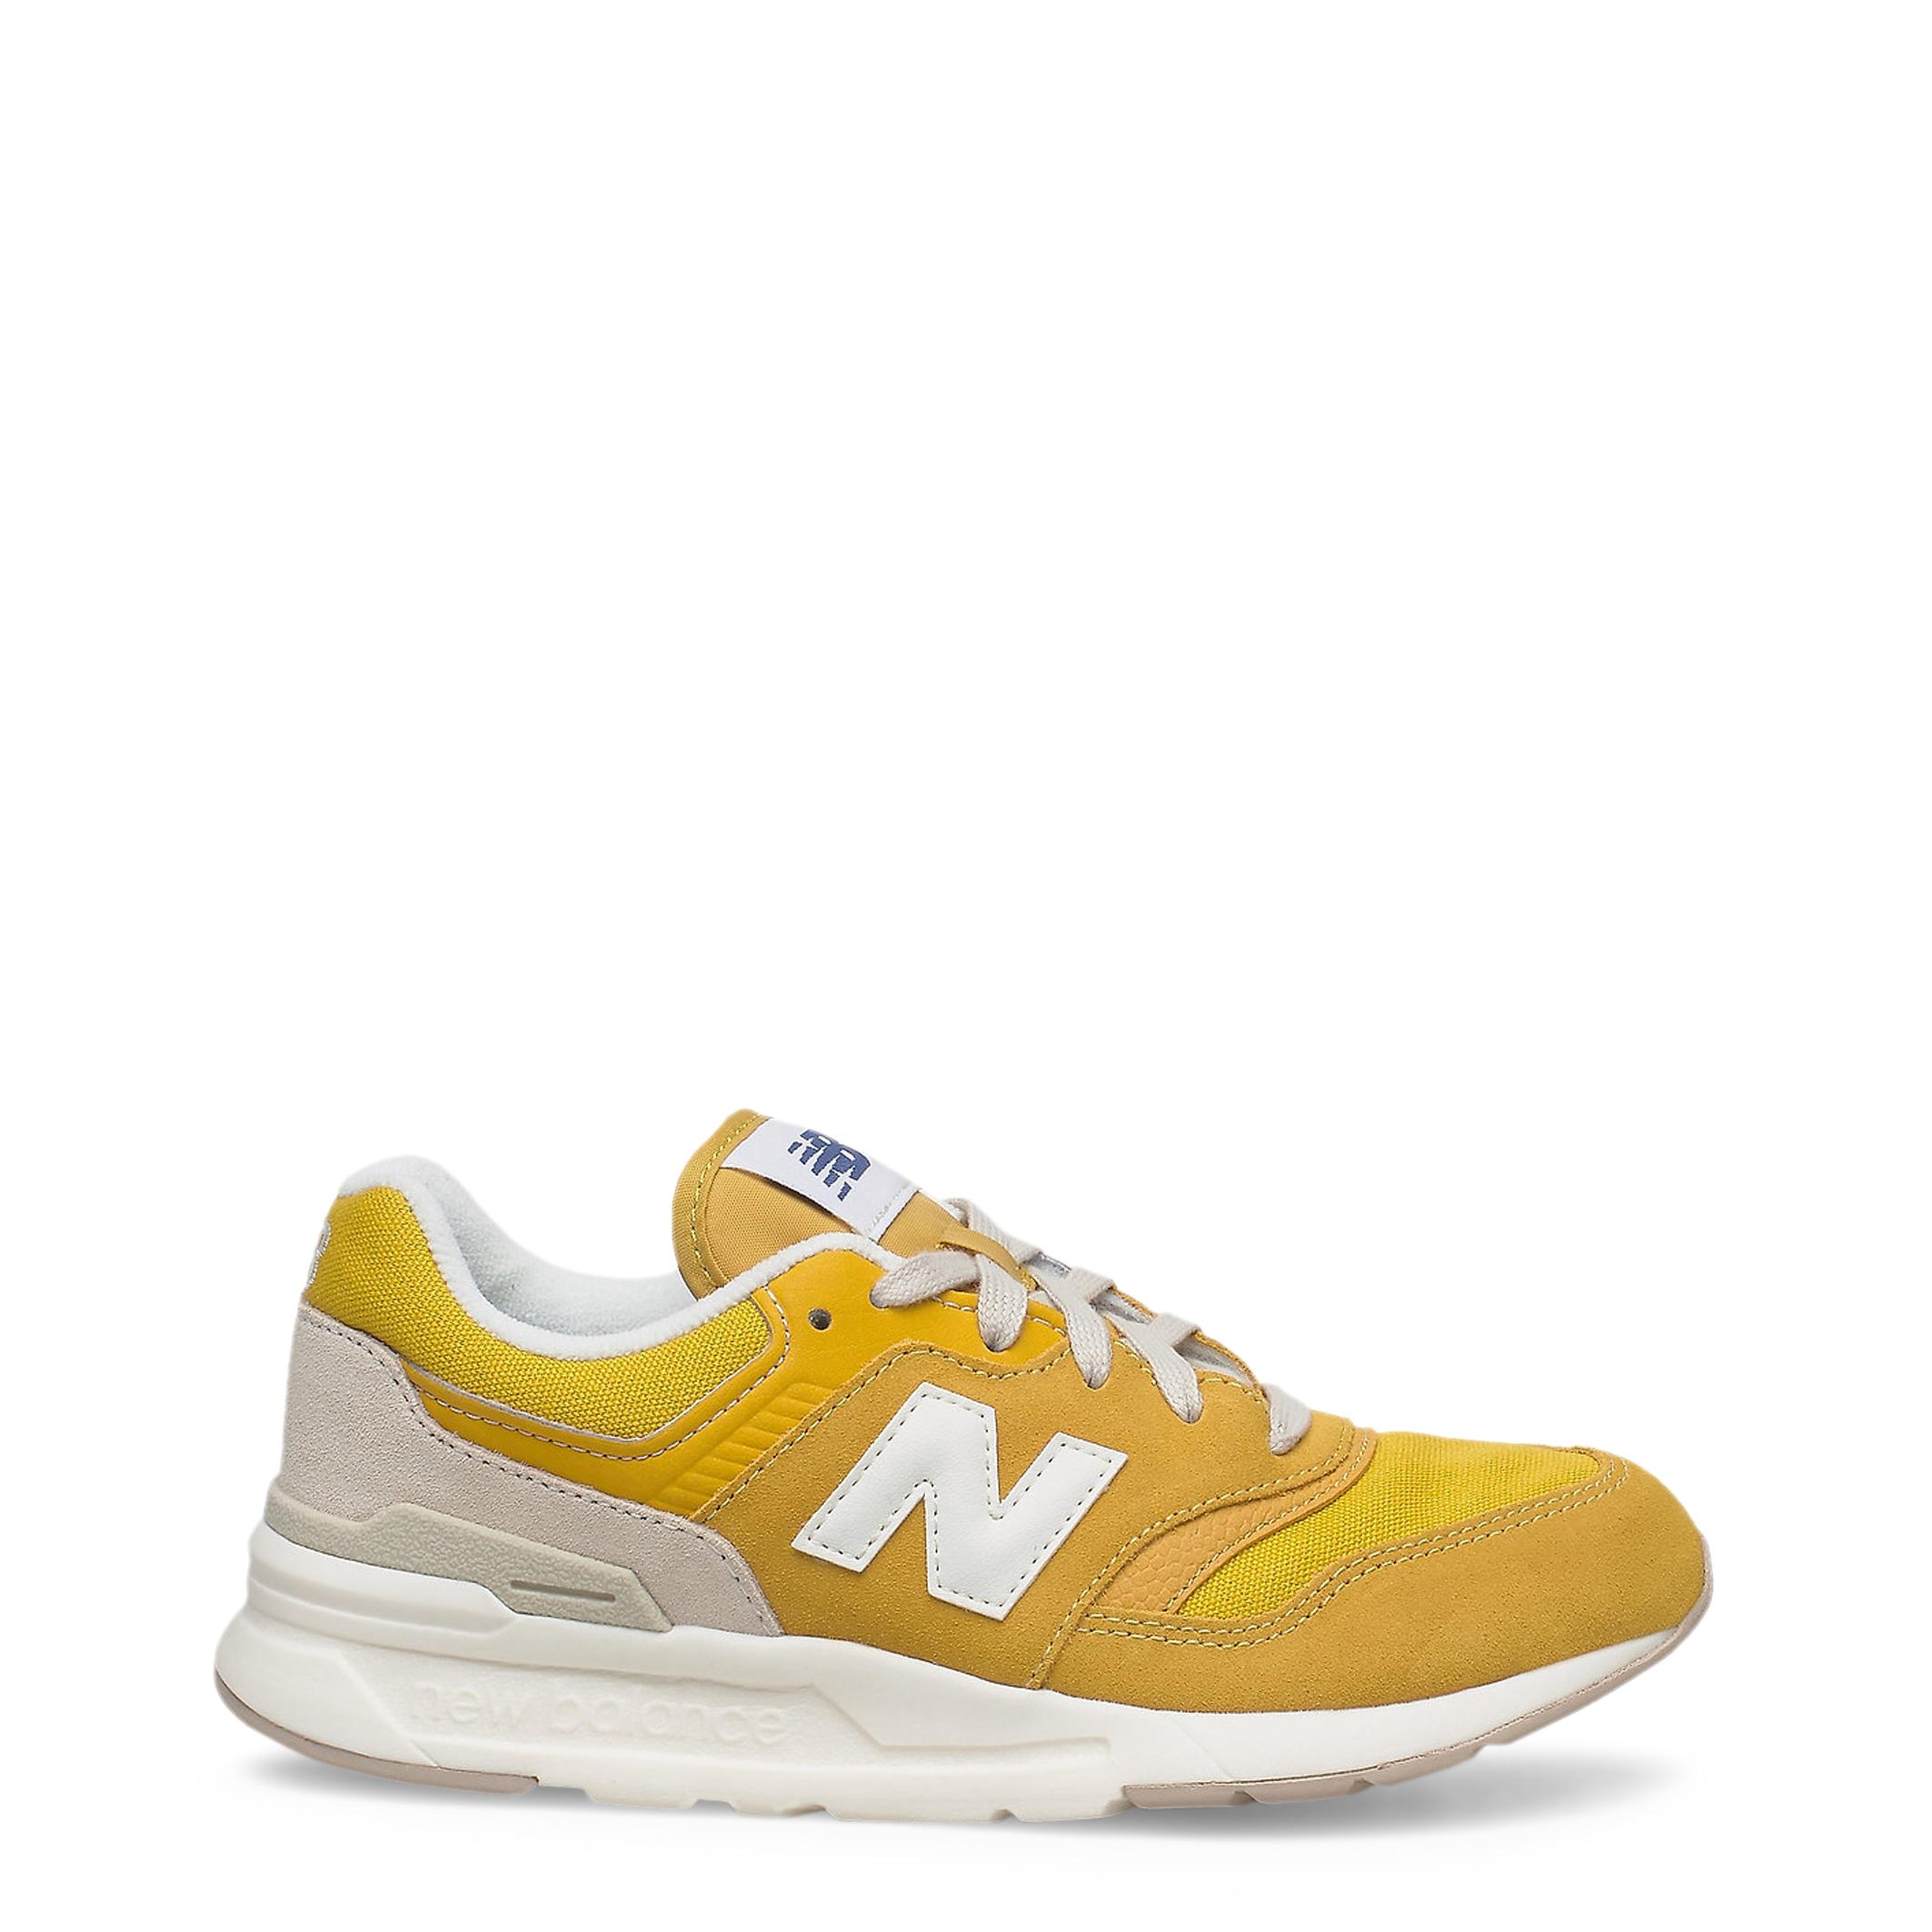 New Balance GR997